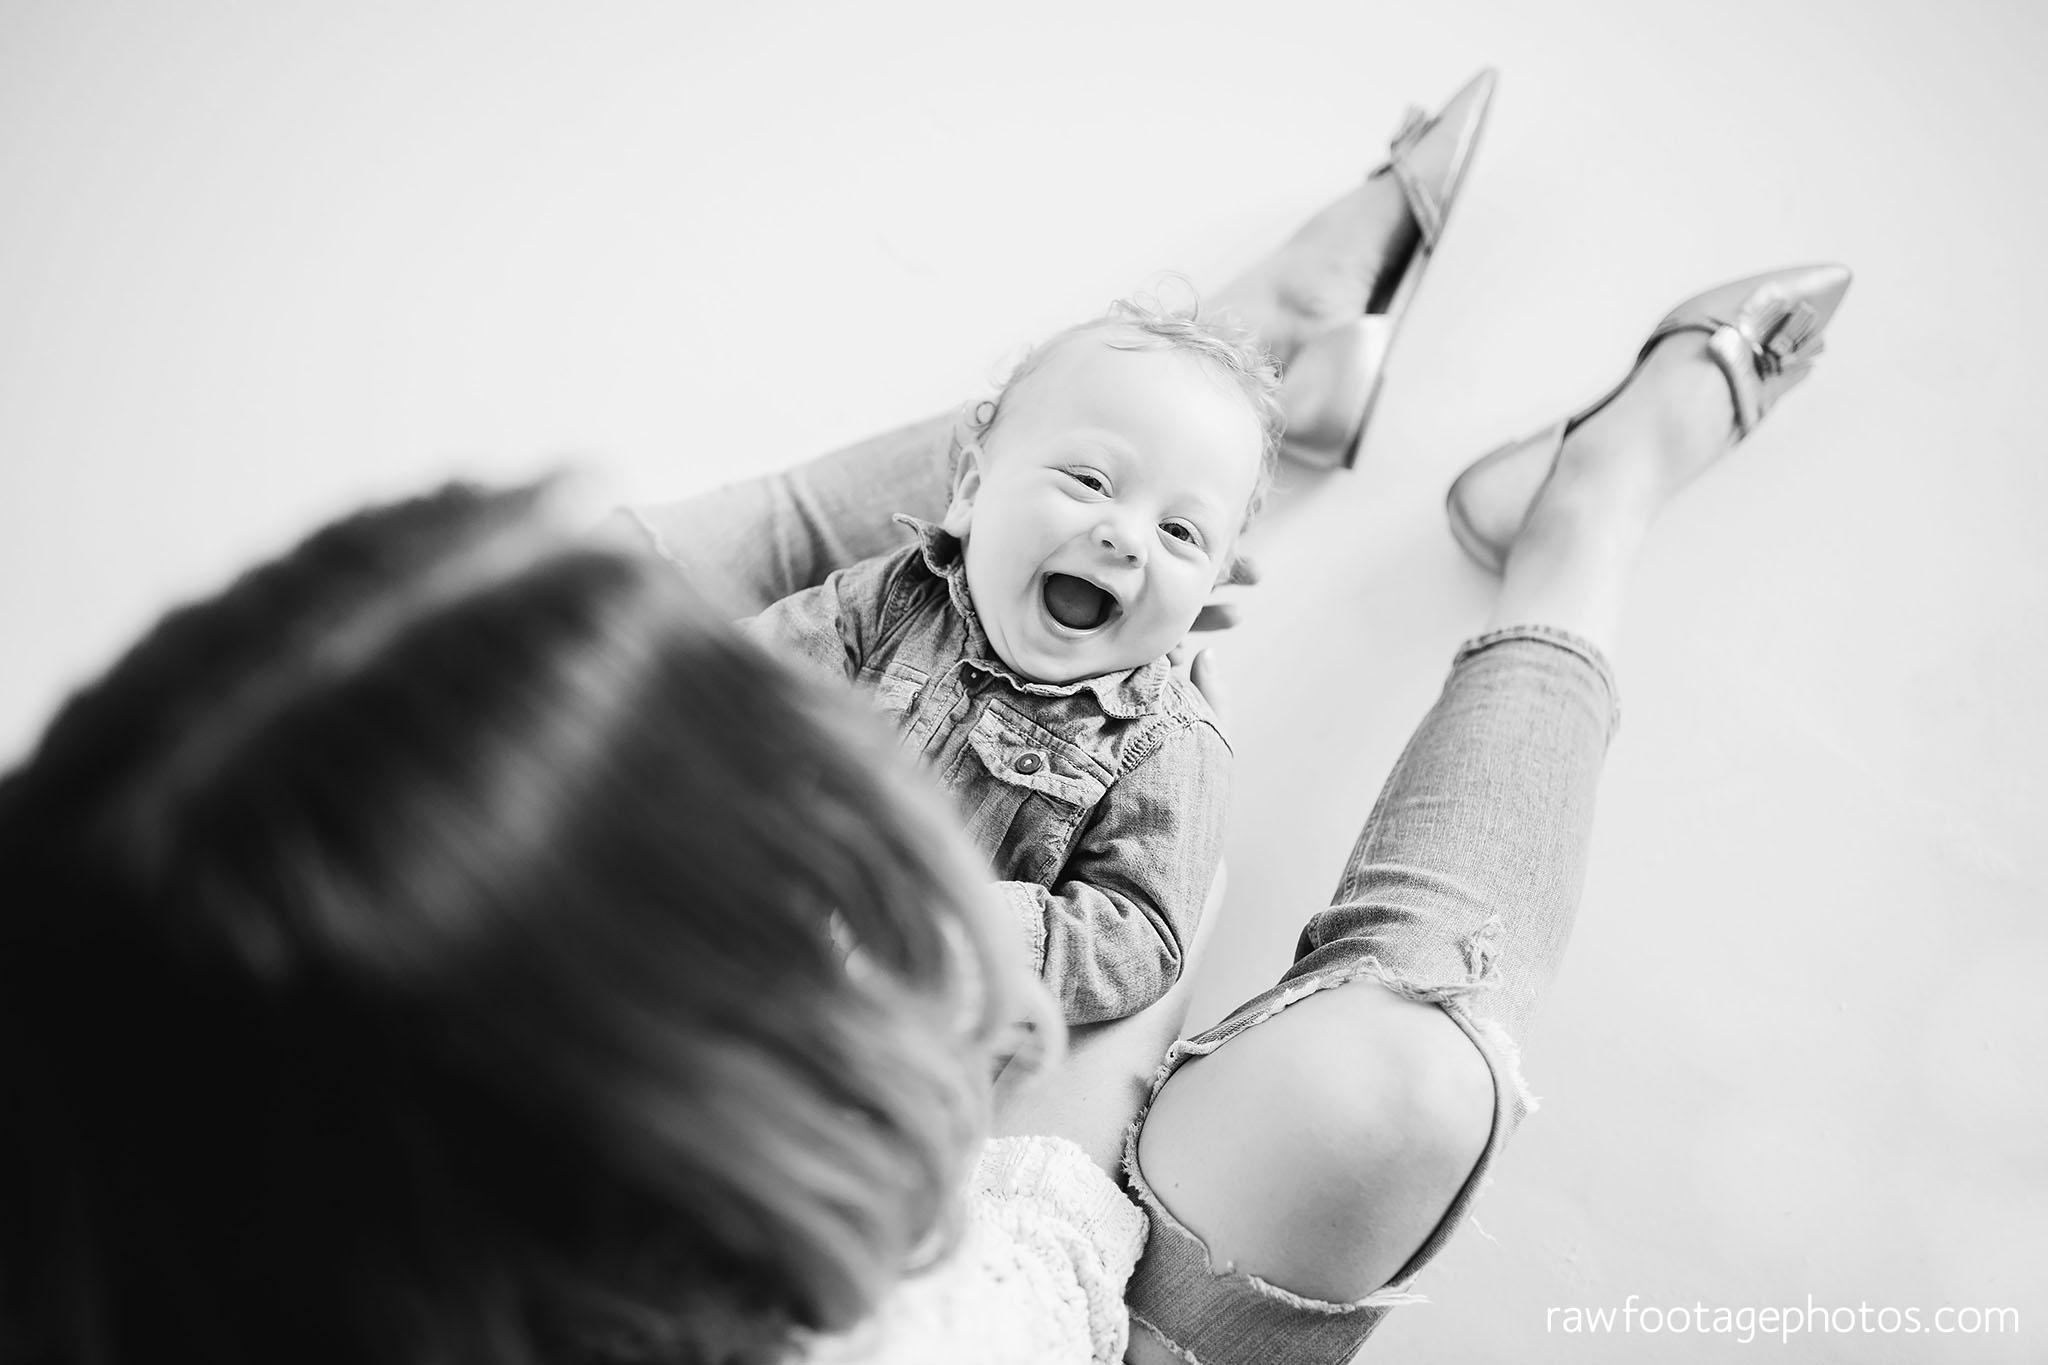 london_ontario_family_photographer-studio_photography-studio_lifestyle_portraits-white_studio-mother_son-candid_family_photography-raw_footage_photography008.jpg